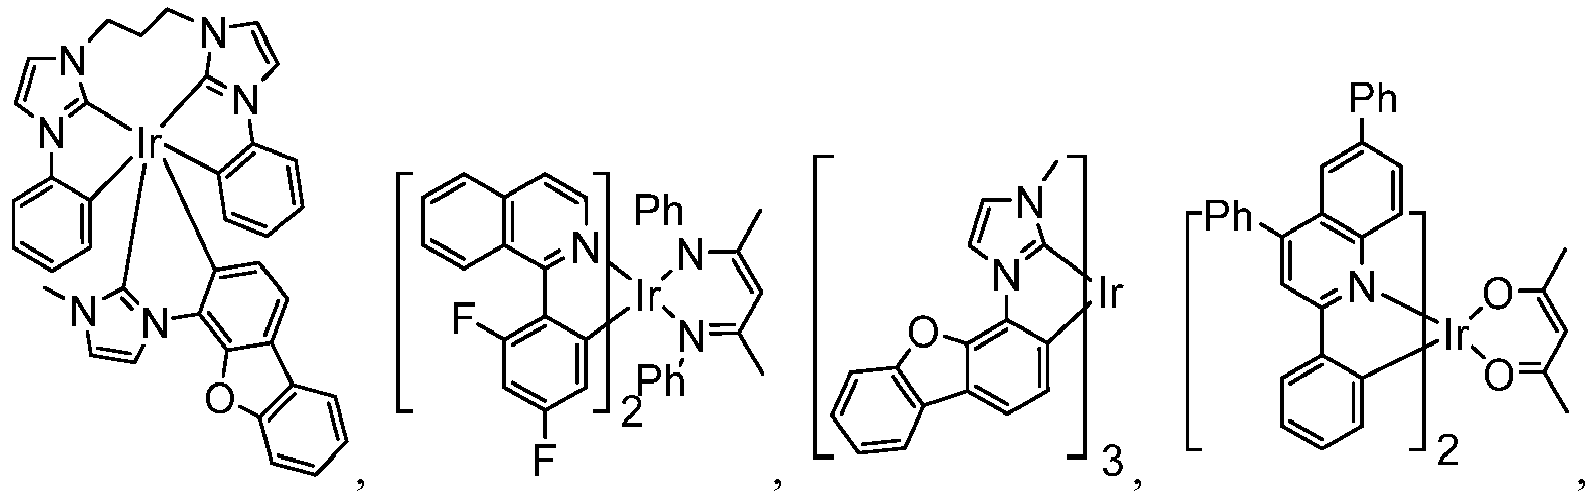 Figure imgb0272